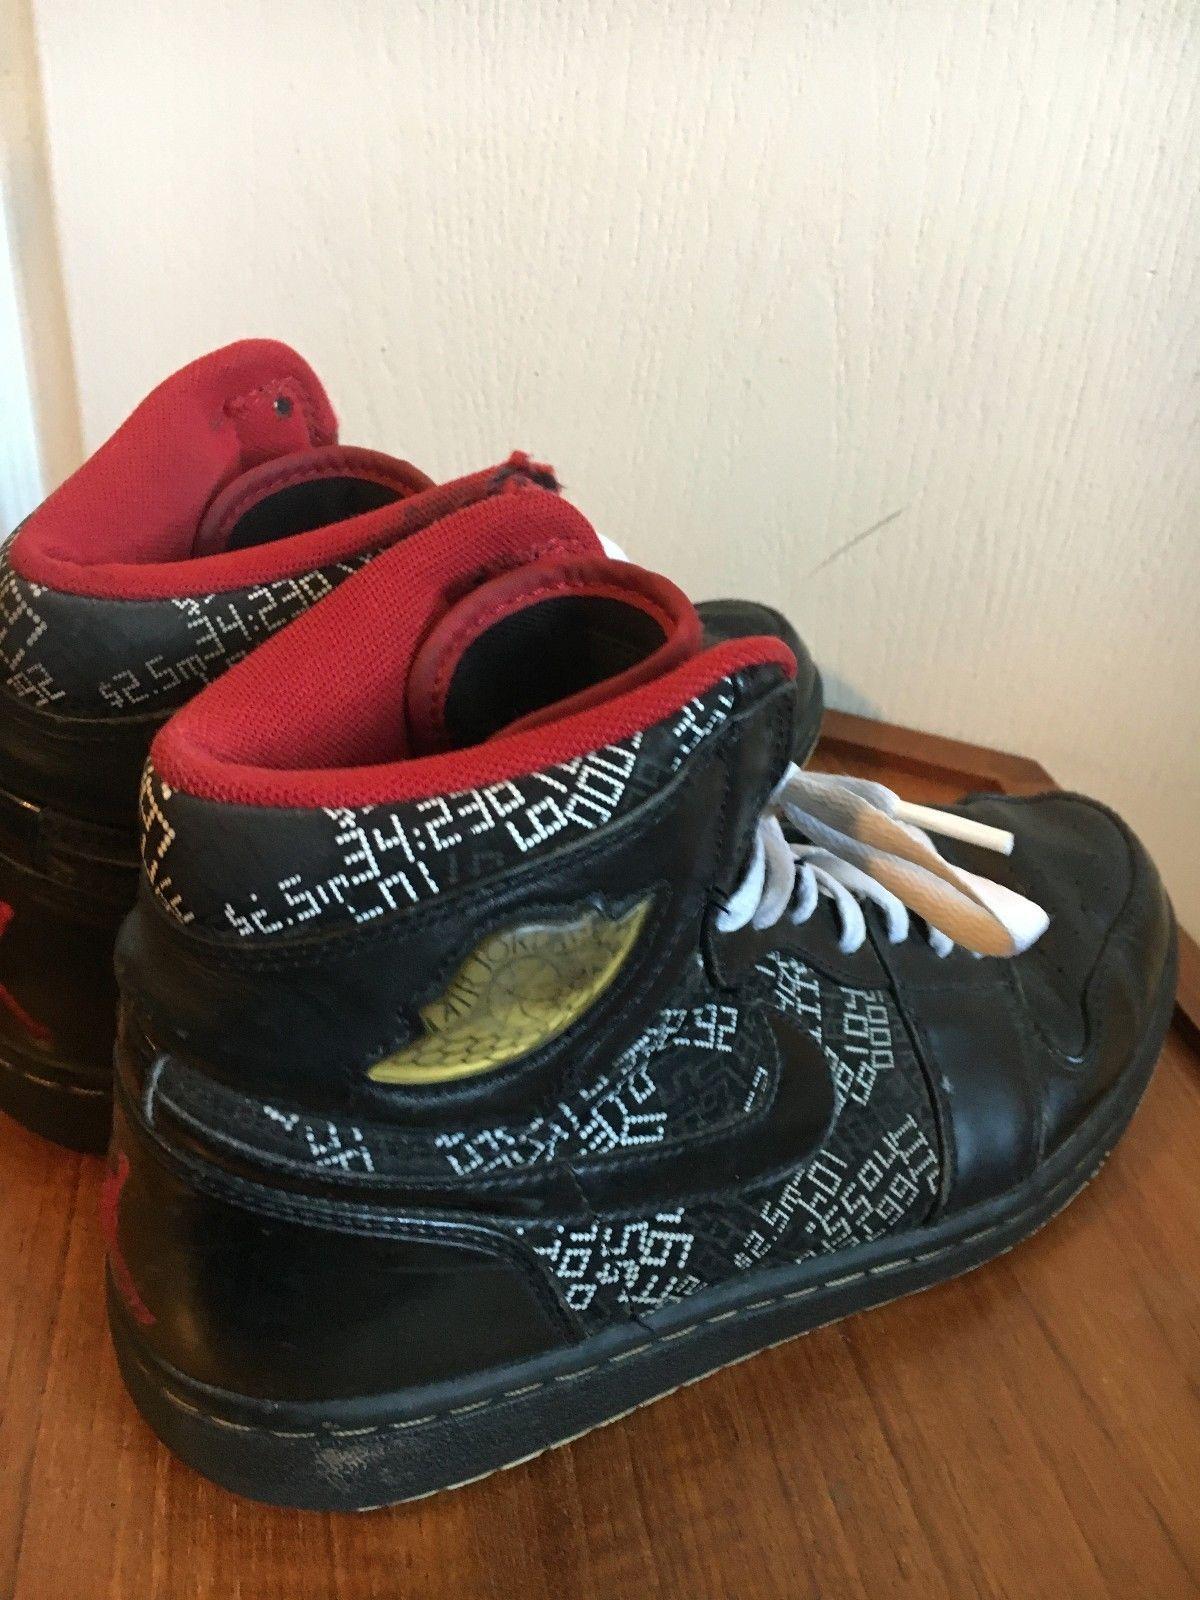 best loved a9e50 33bce 371498-012 Air Jordan 1 Nike Hall of Fame 09 Black Red ...